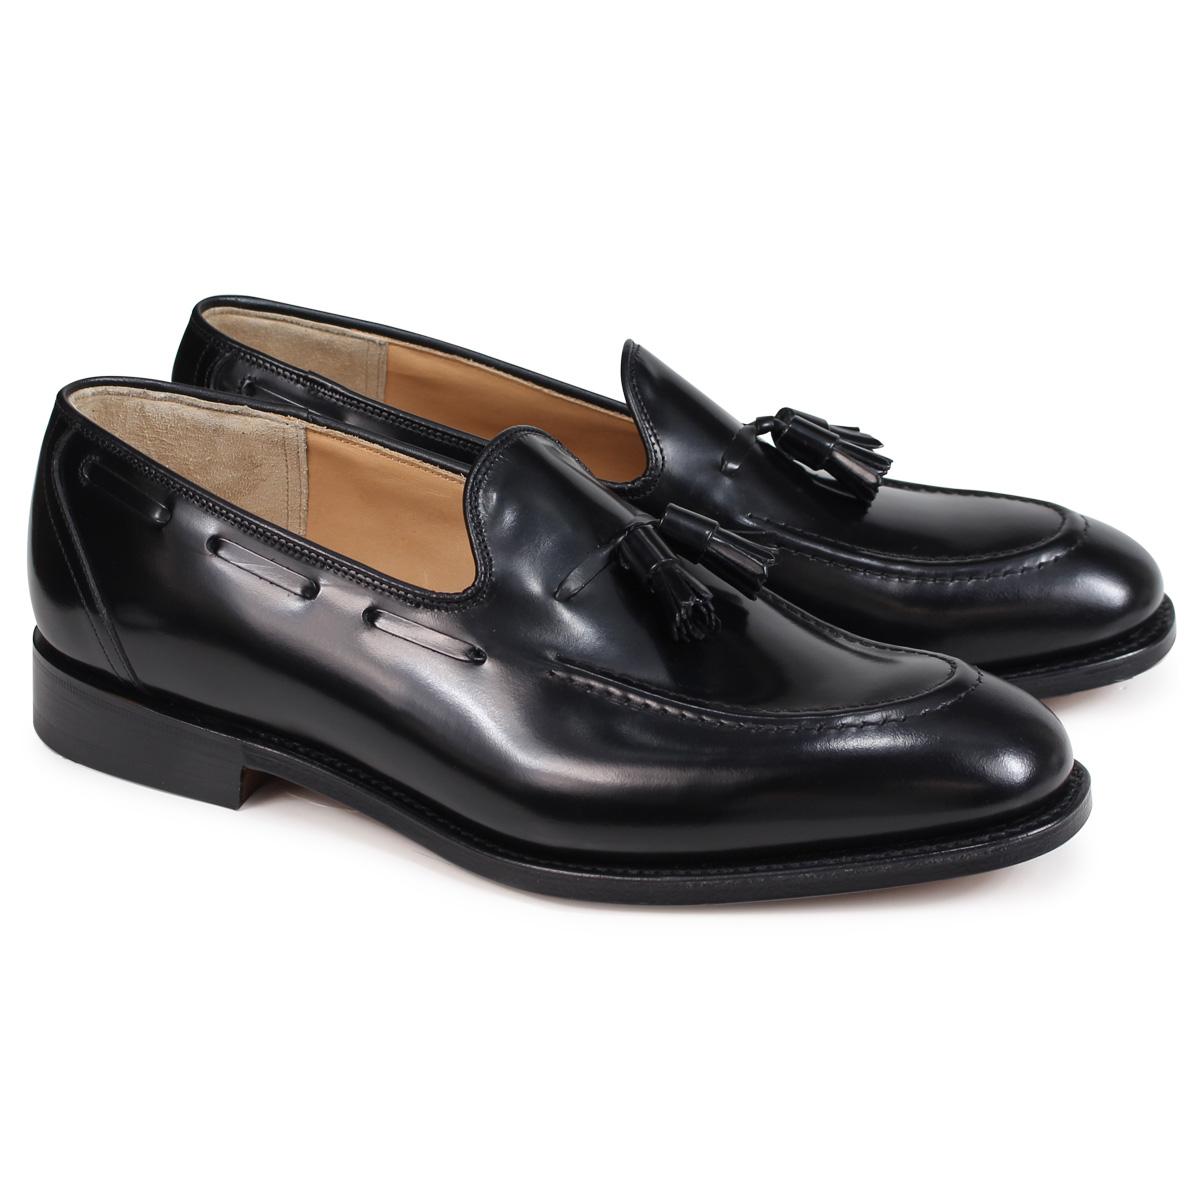 Churchs KINGSLEY 2 POLISHED BINDER チャーチ 靴 キングスレー 2 ローファー メンズ タッセルローファー メンズ EDB027 ブラック